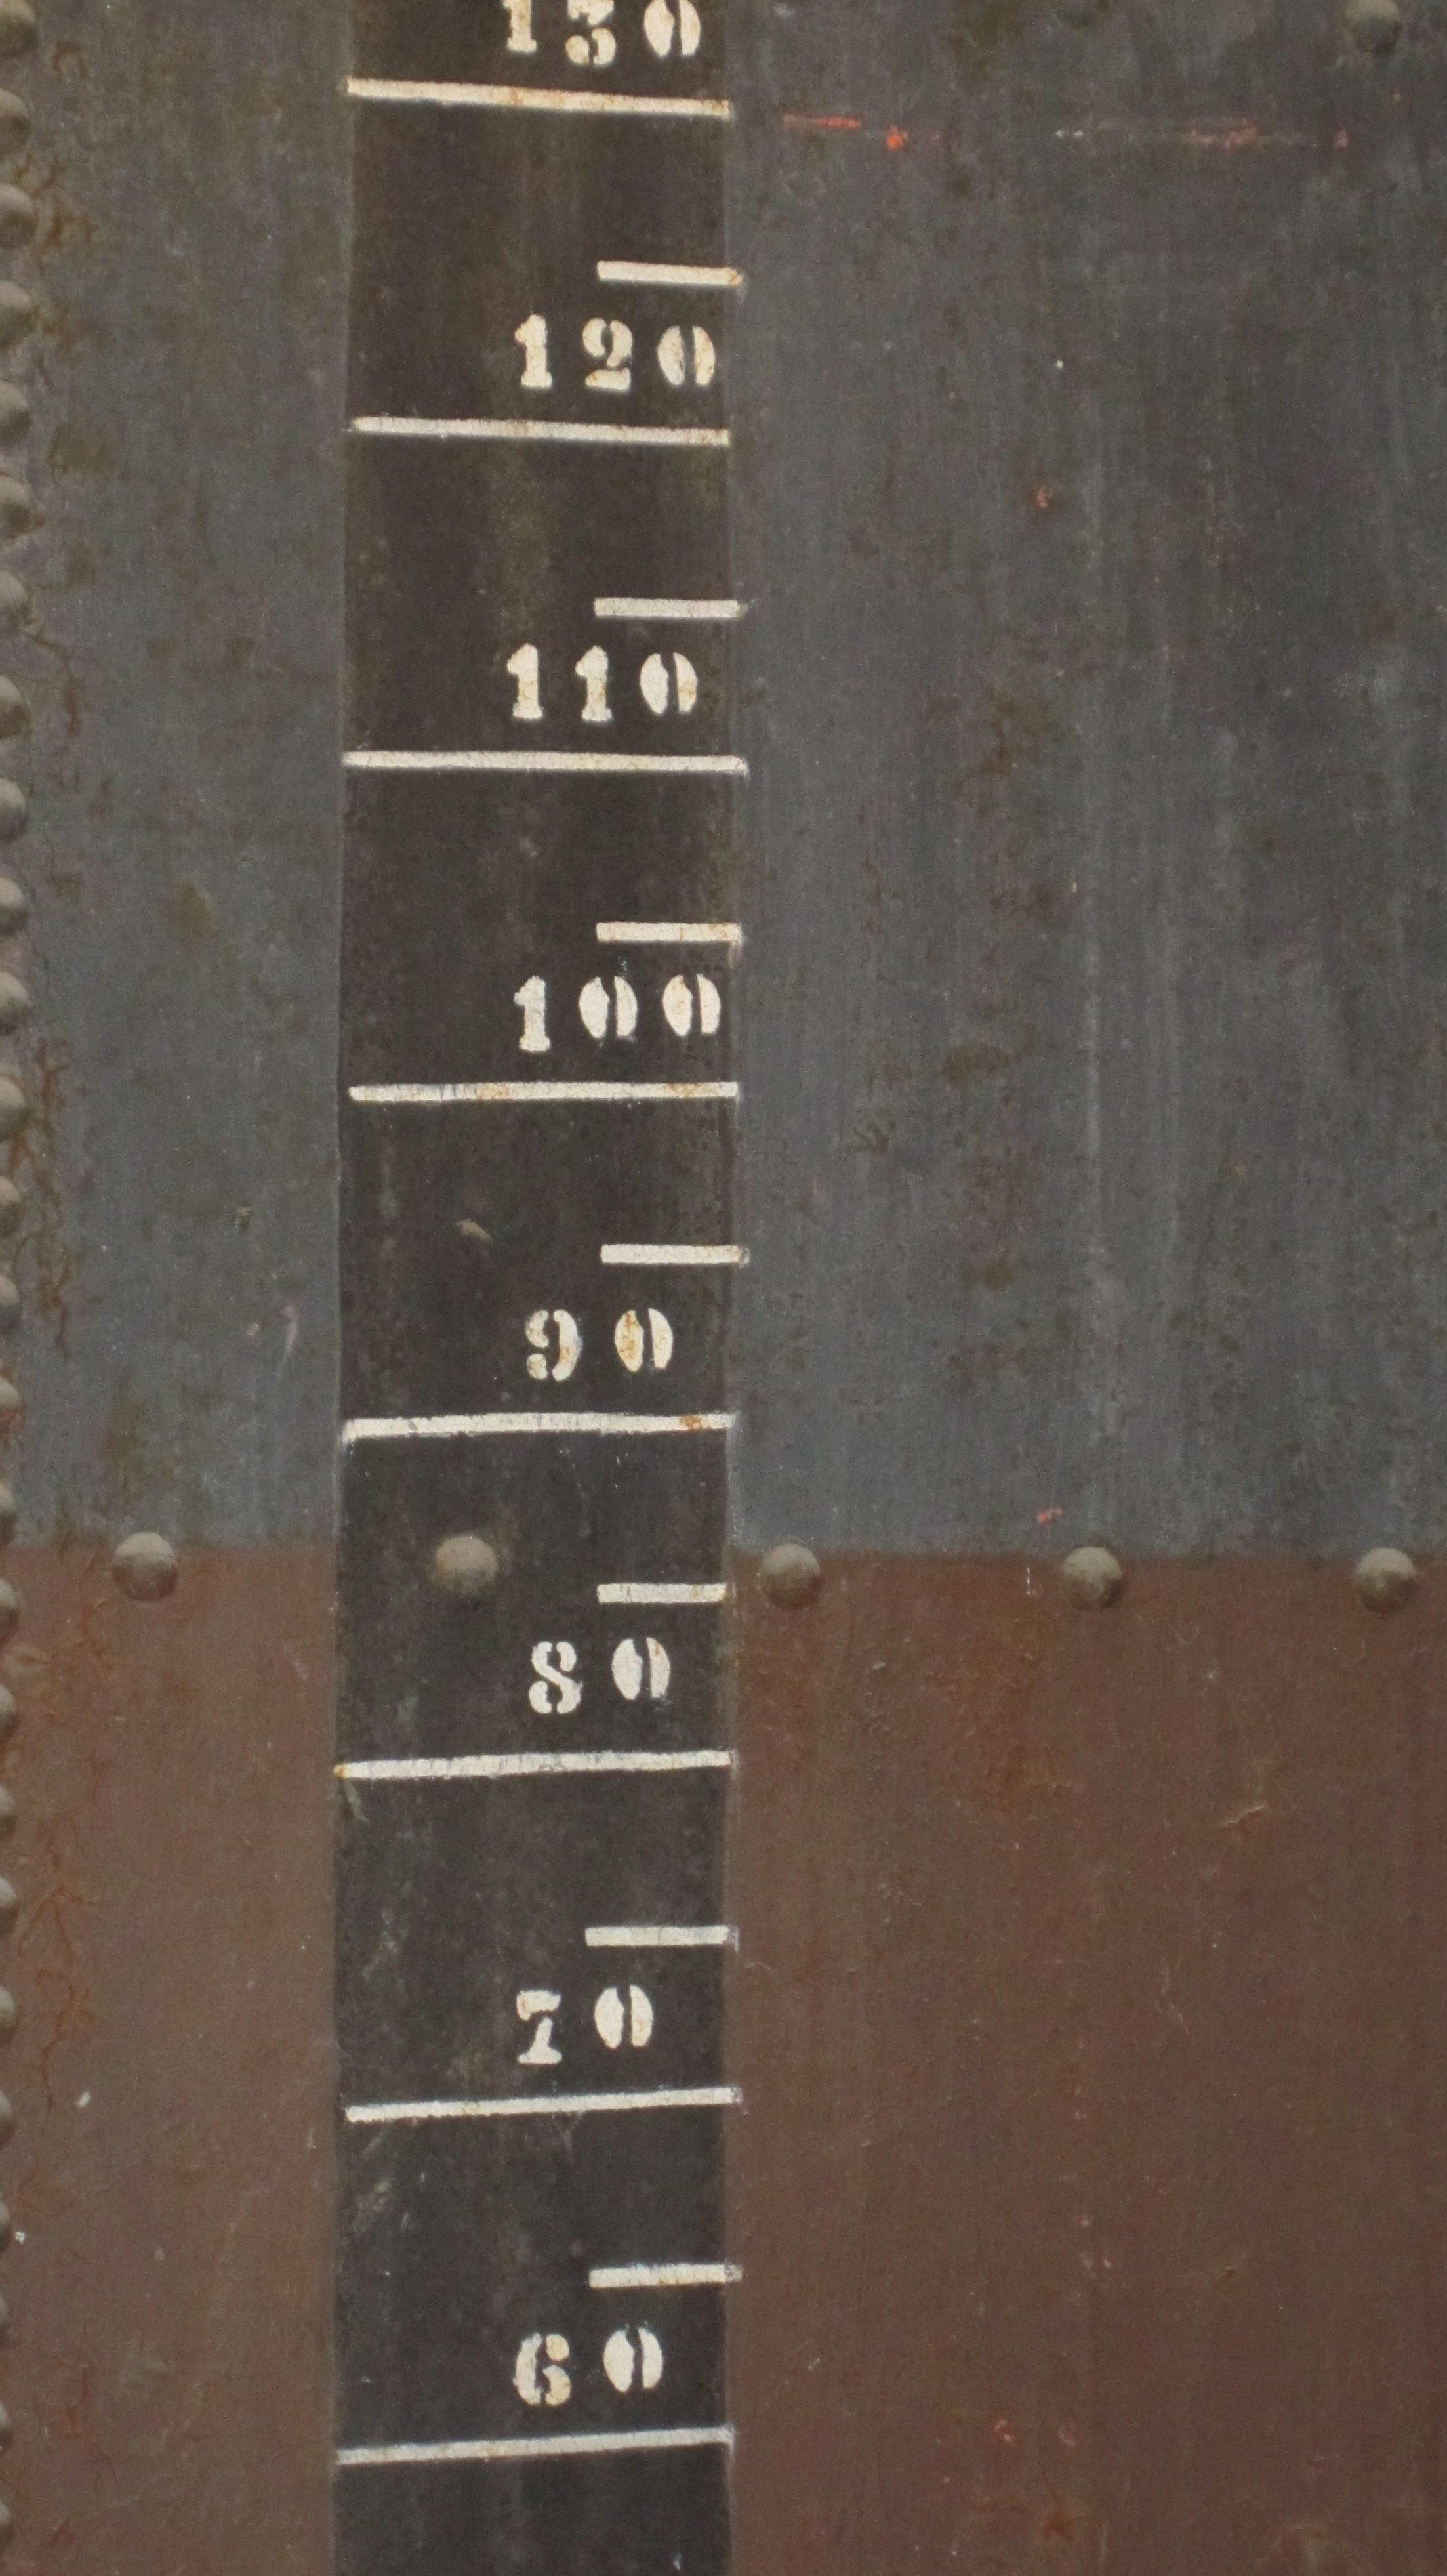 Oil tank measurements, Arsenale